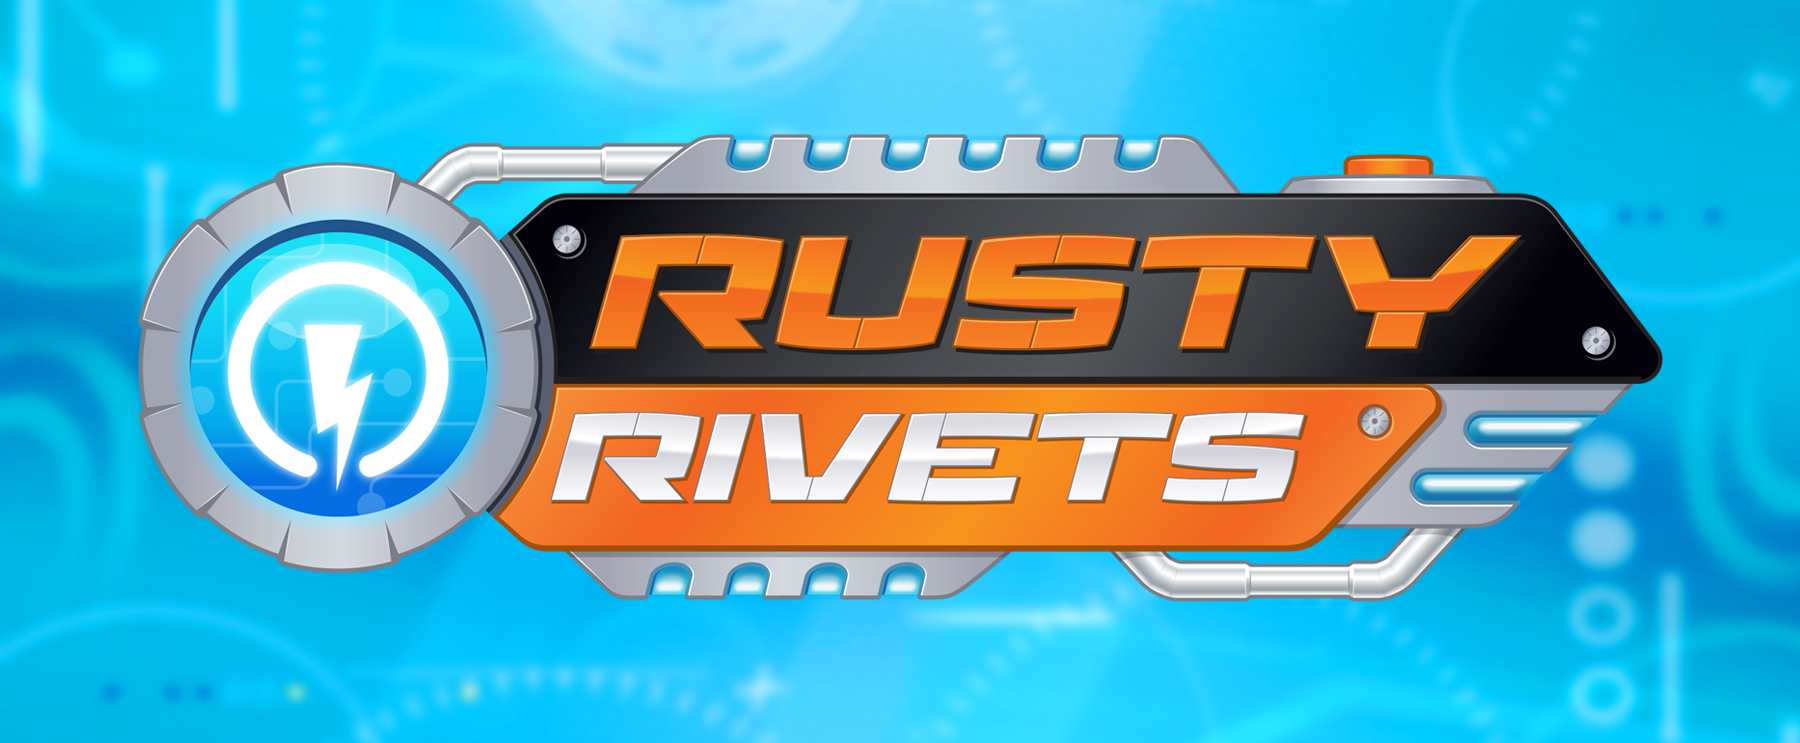 Rusty Rivets Branding - Img 2